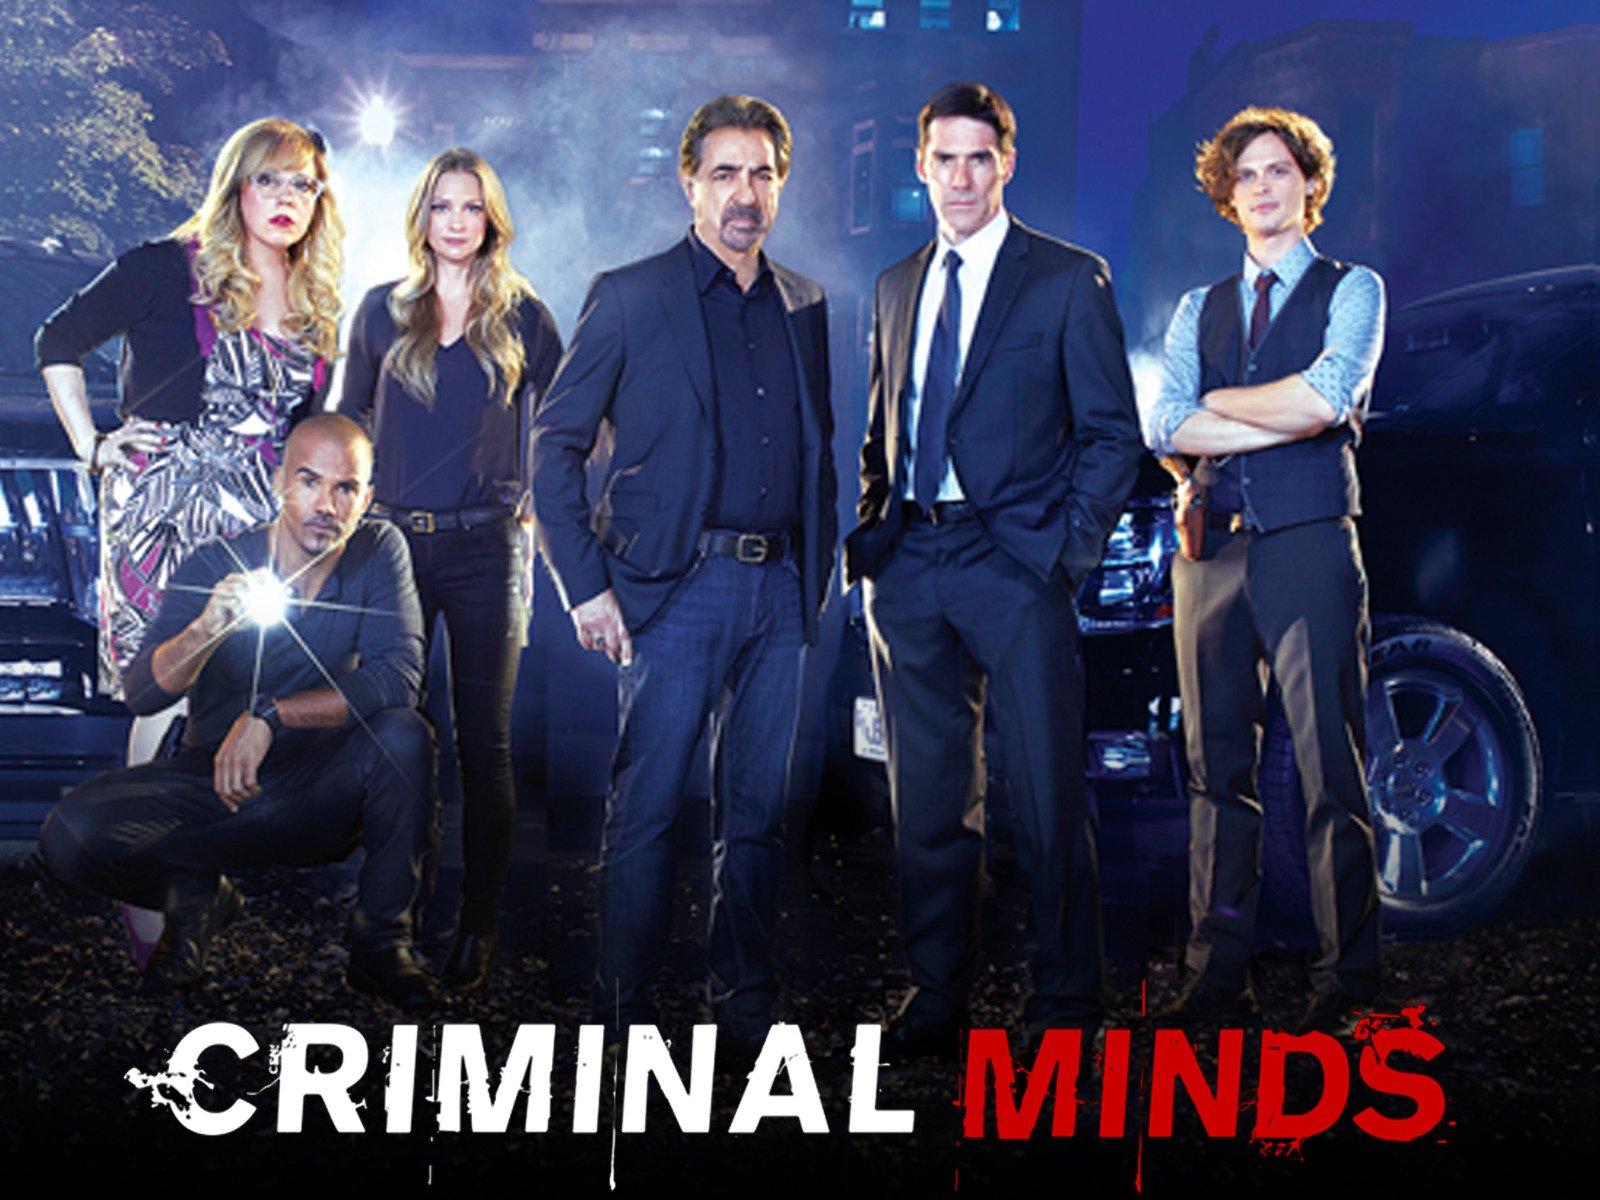 criminal minds online free season 11